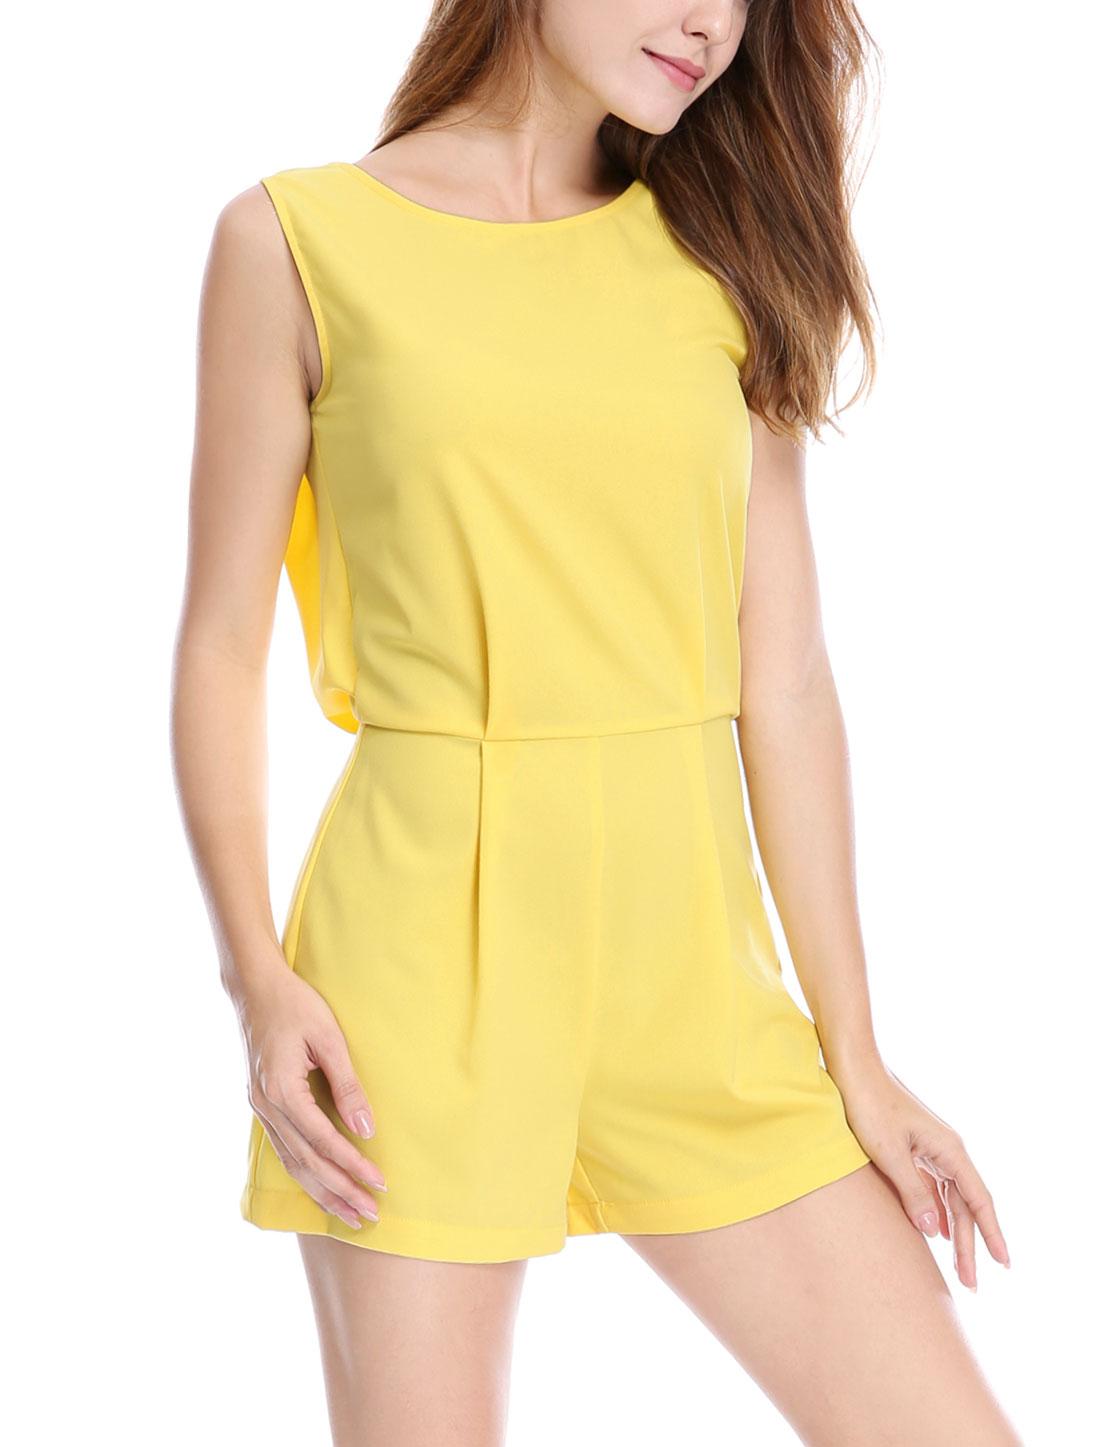 Women Sleeveless Crew Neck Lace Insert Back Romper Yellow S